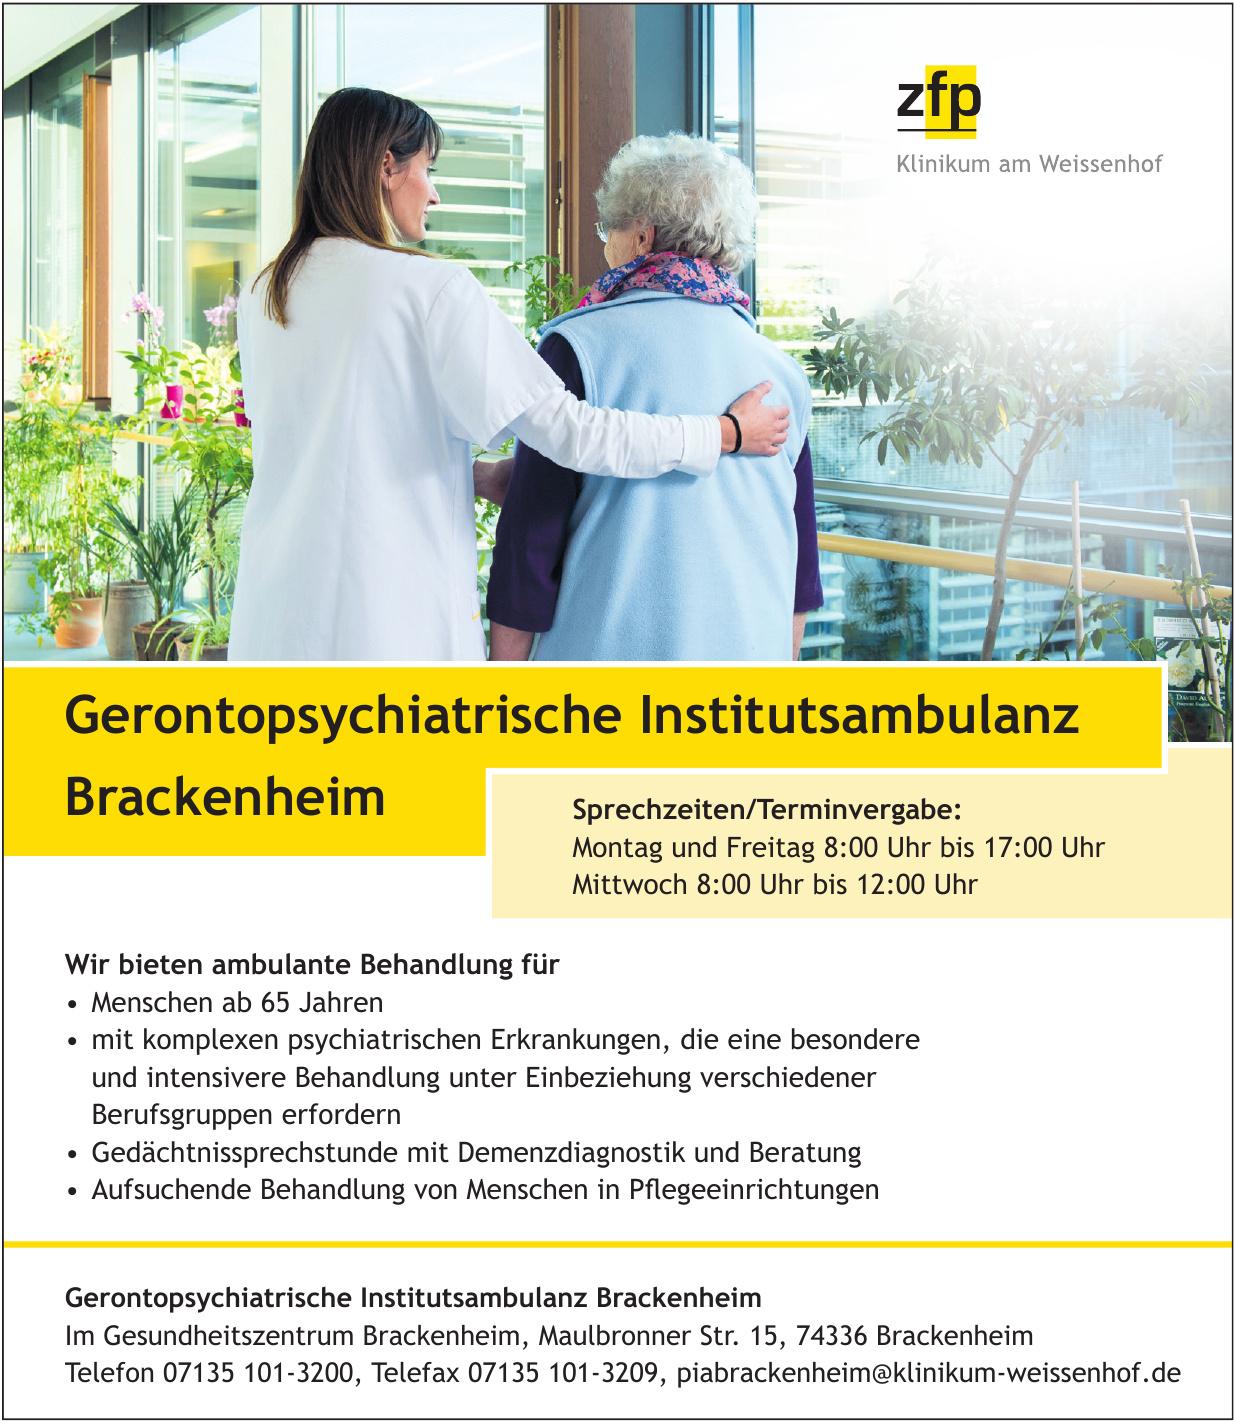 Gerontopsychiatrische Institutsambulanz Brackenheim